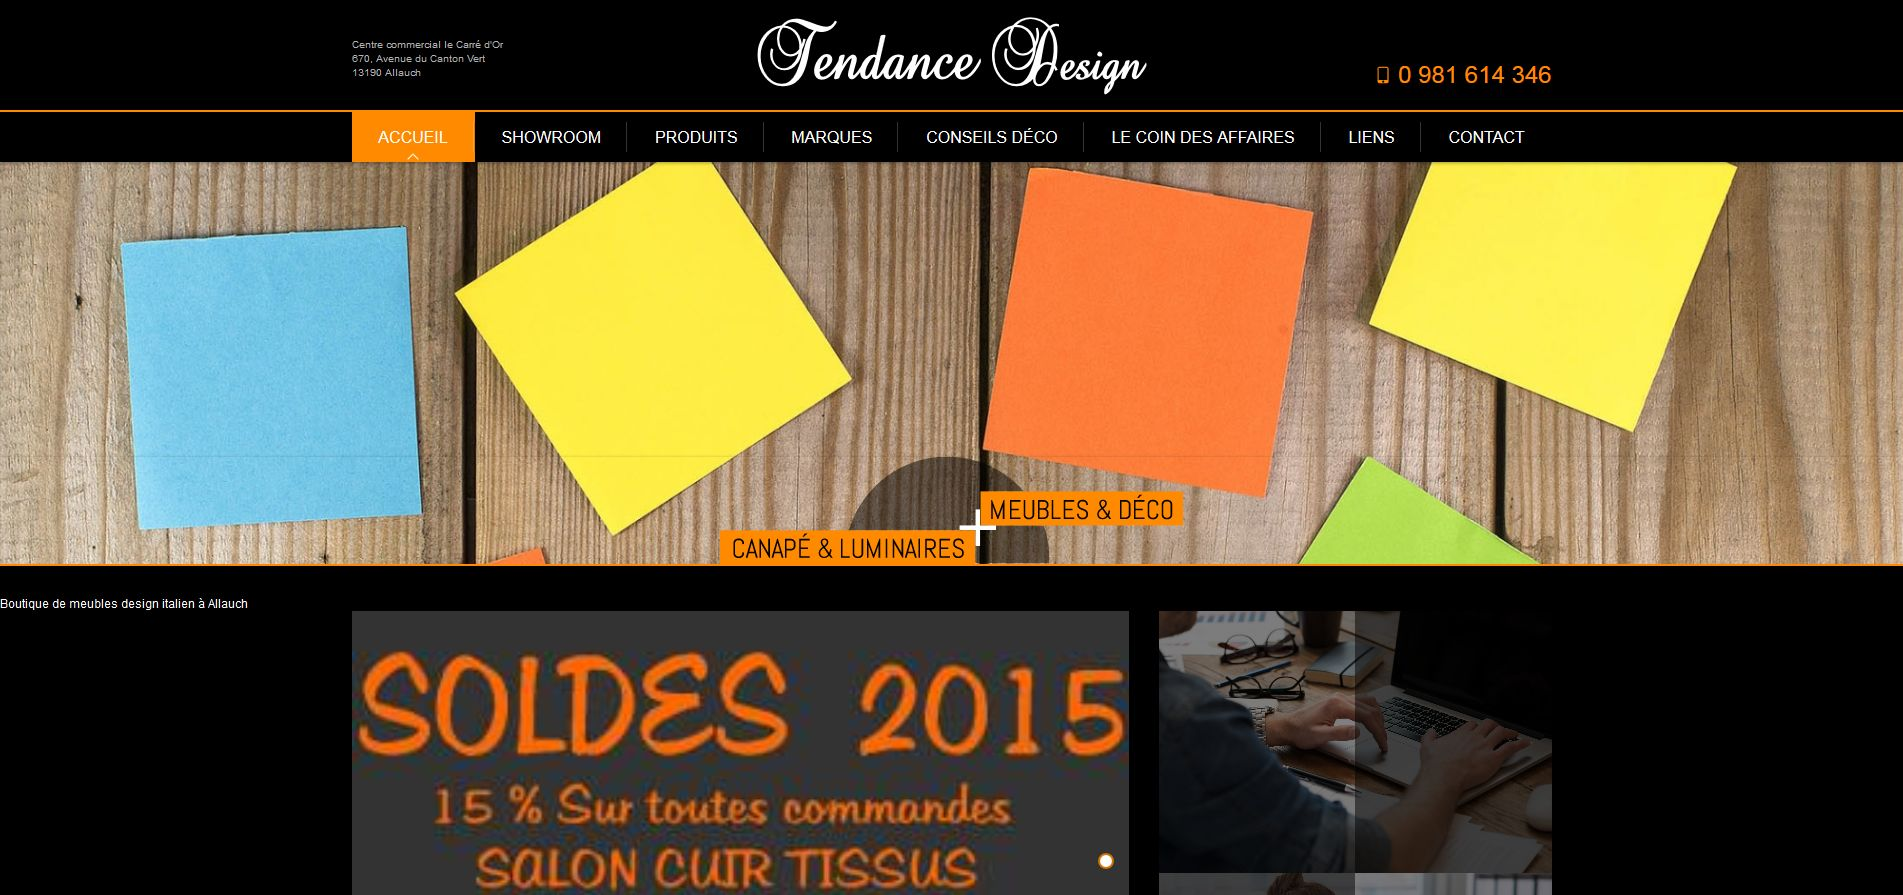 magasin de meubles design allauch tendance design agence web marseille jalis. Black Bedroom Furniture Sets. Home Design Ideas